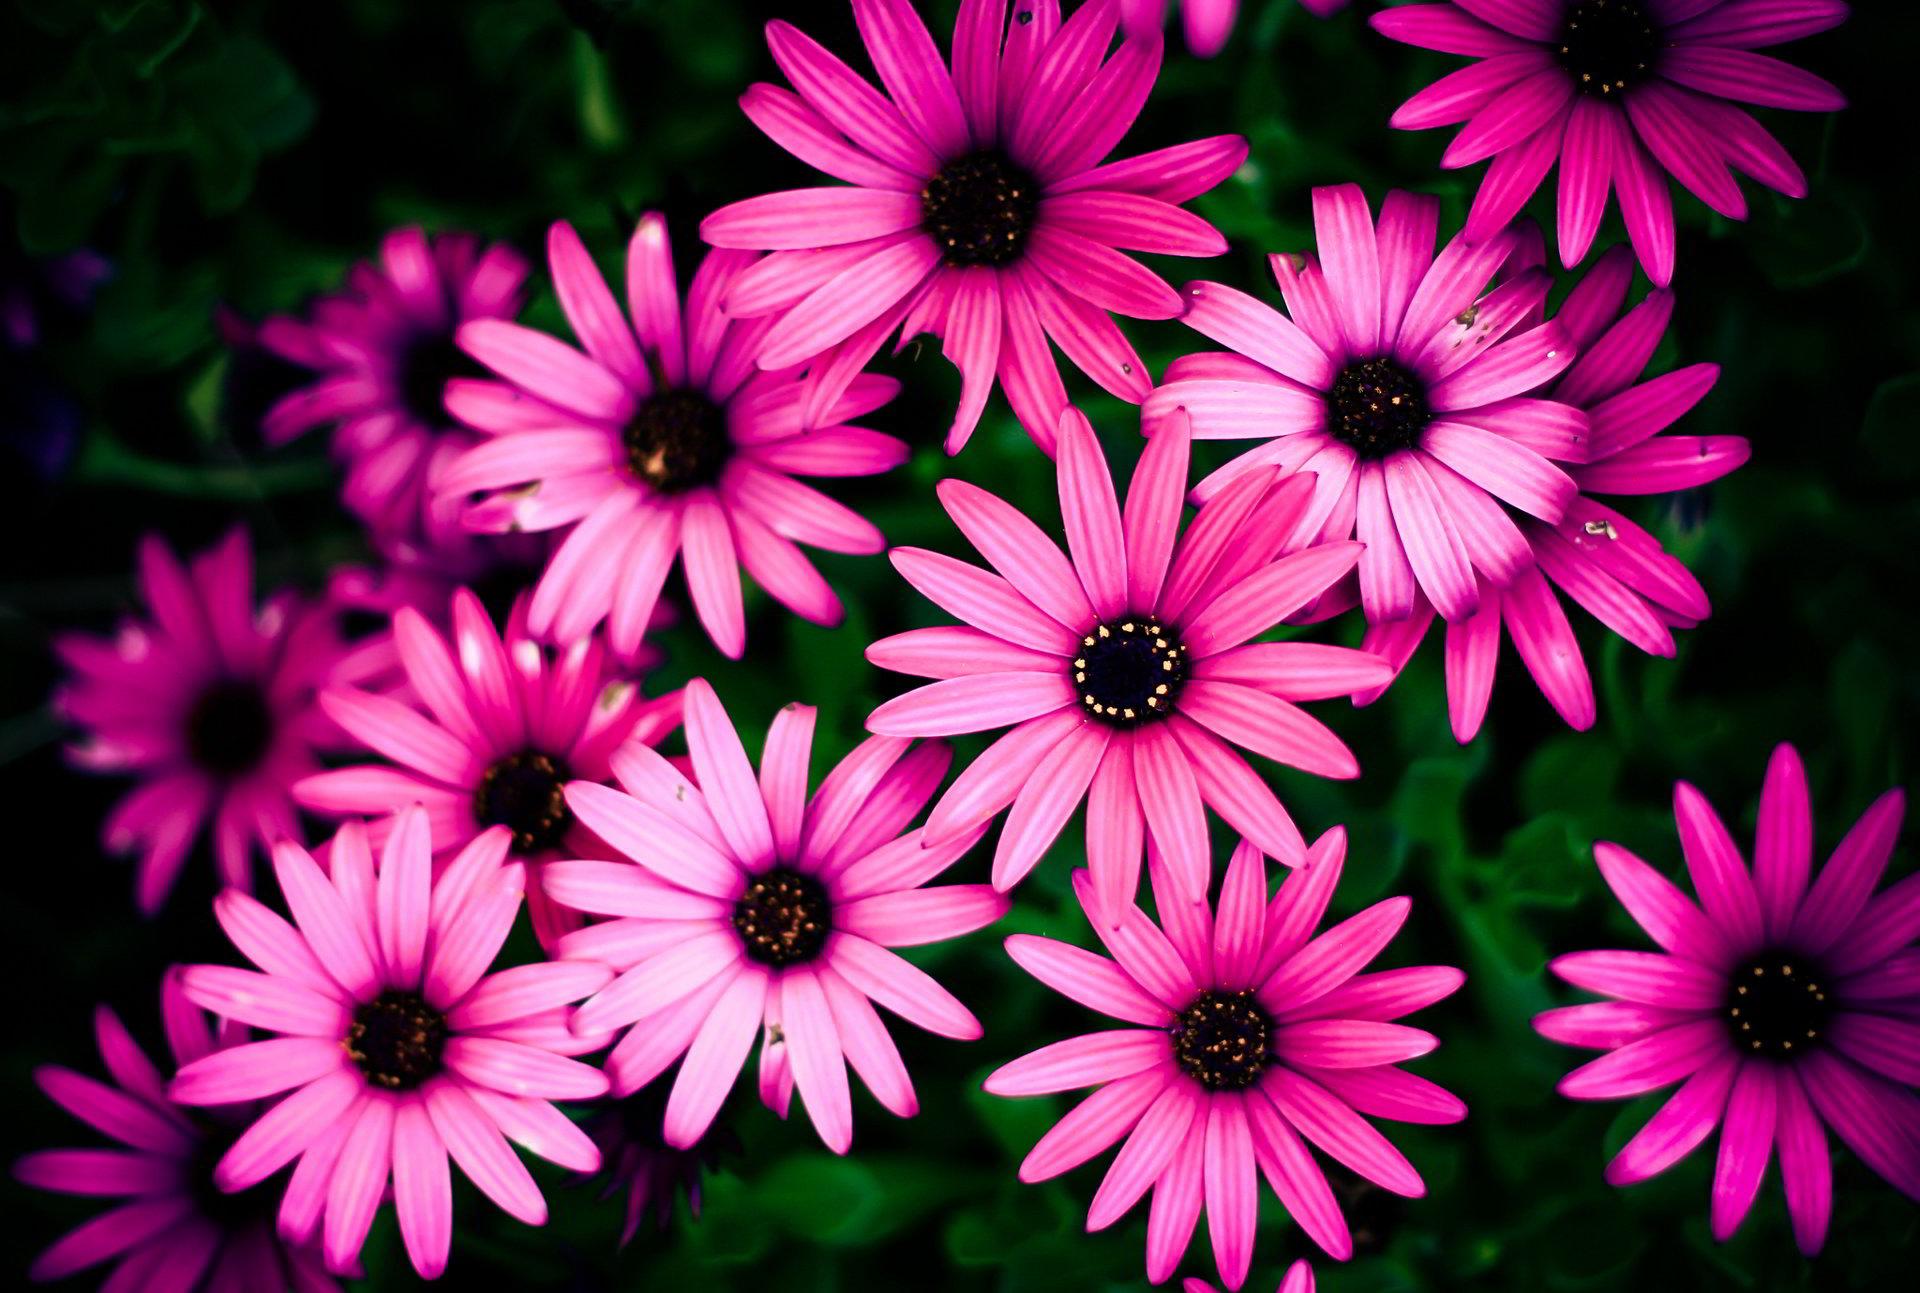 hinh anh hoa cuc dep 14